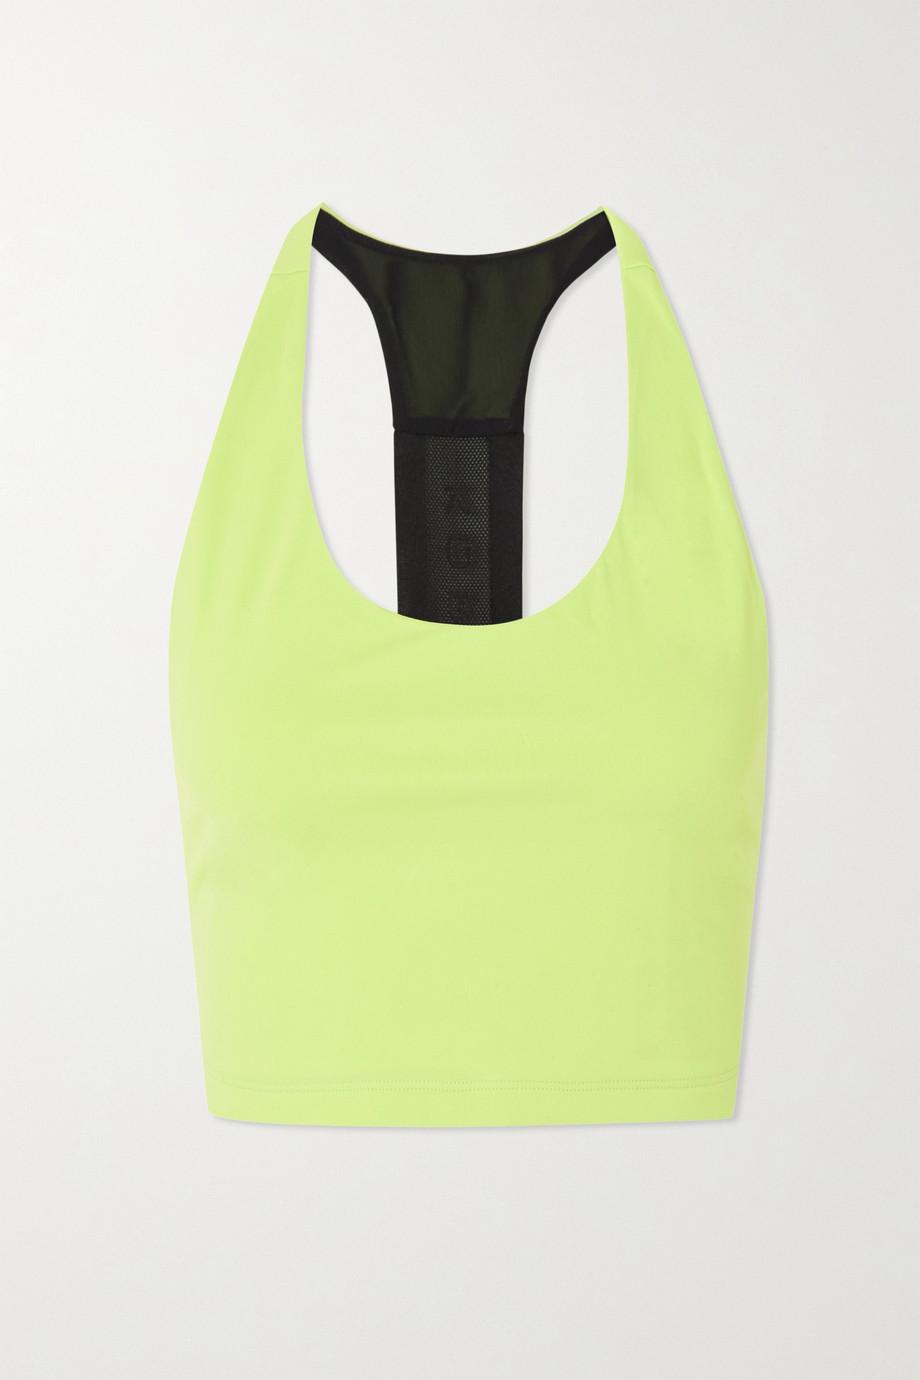 Koral Dakota stretch sports bra